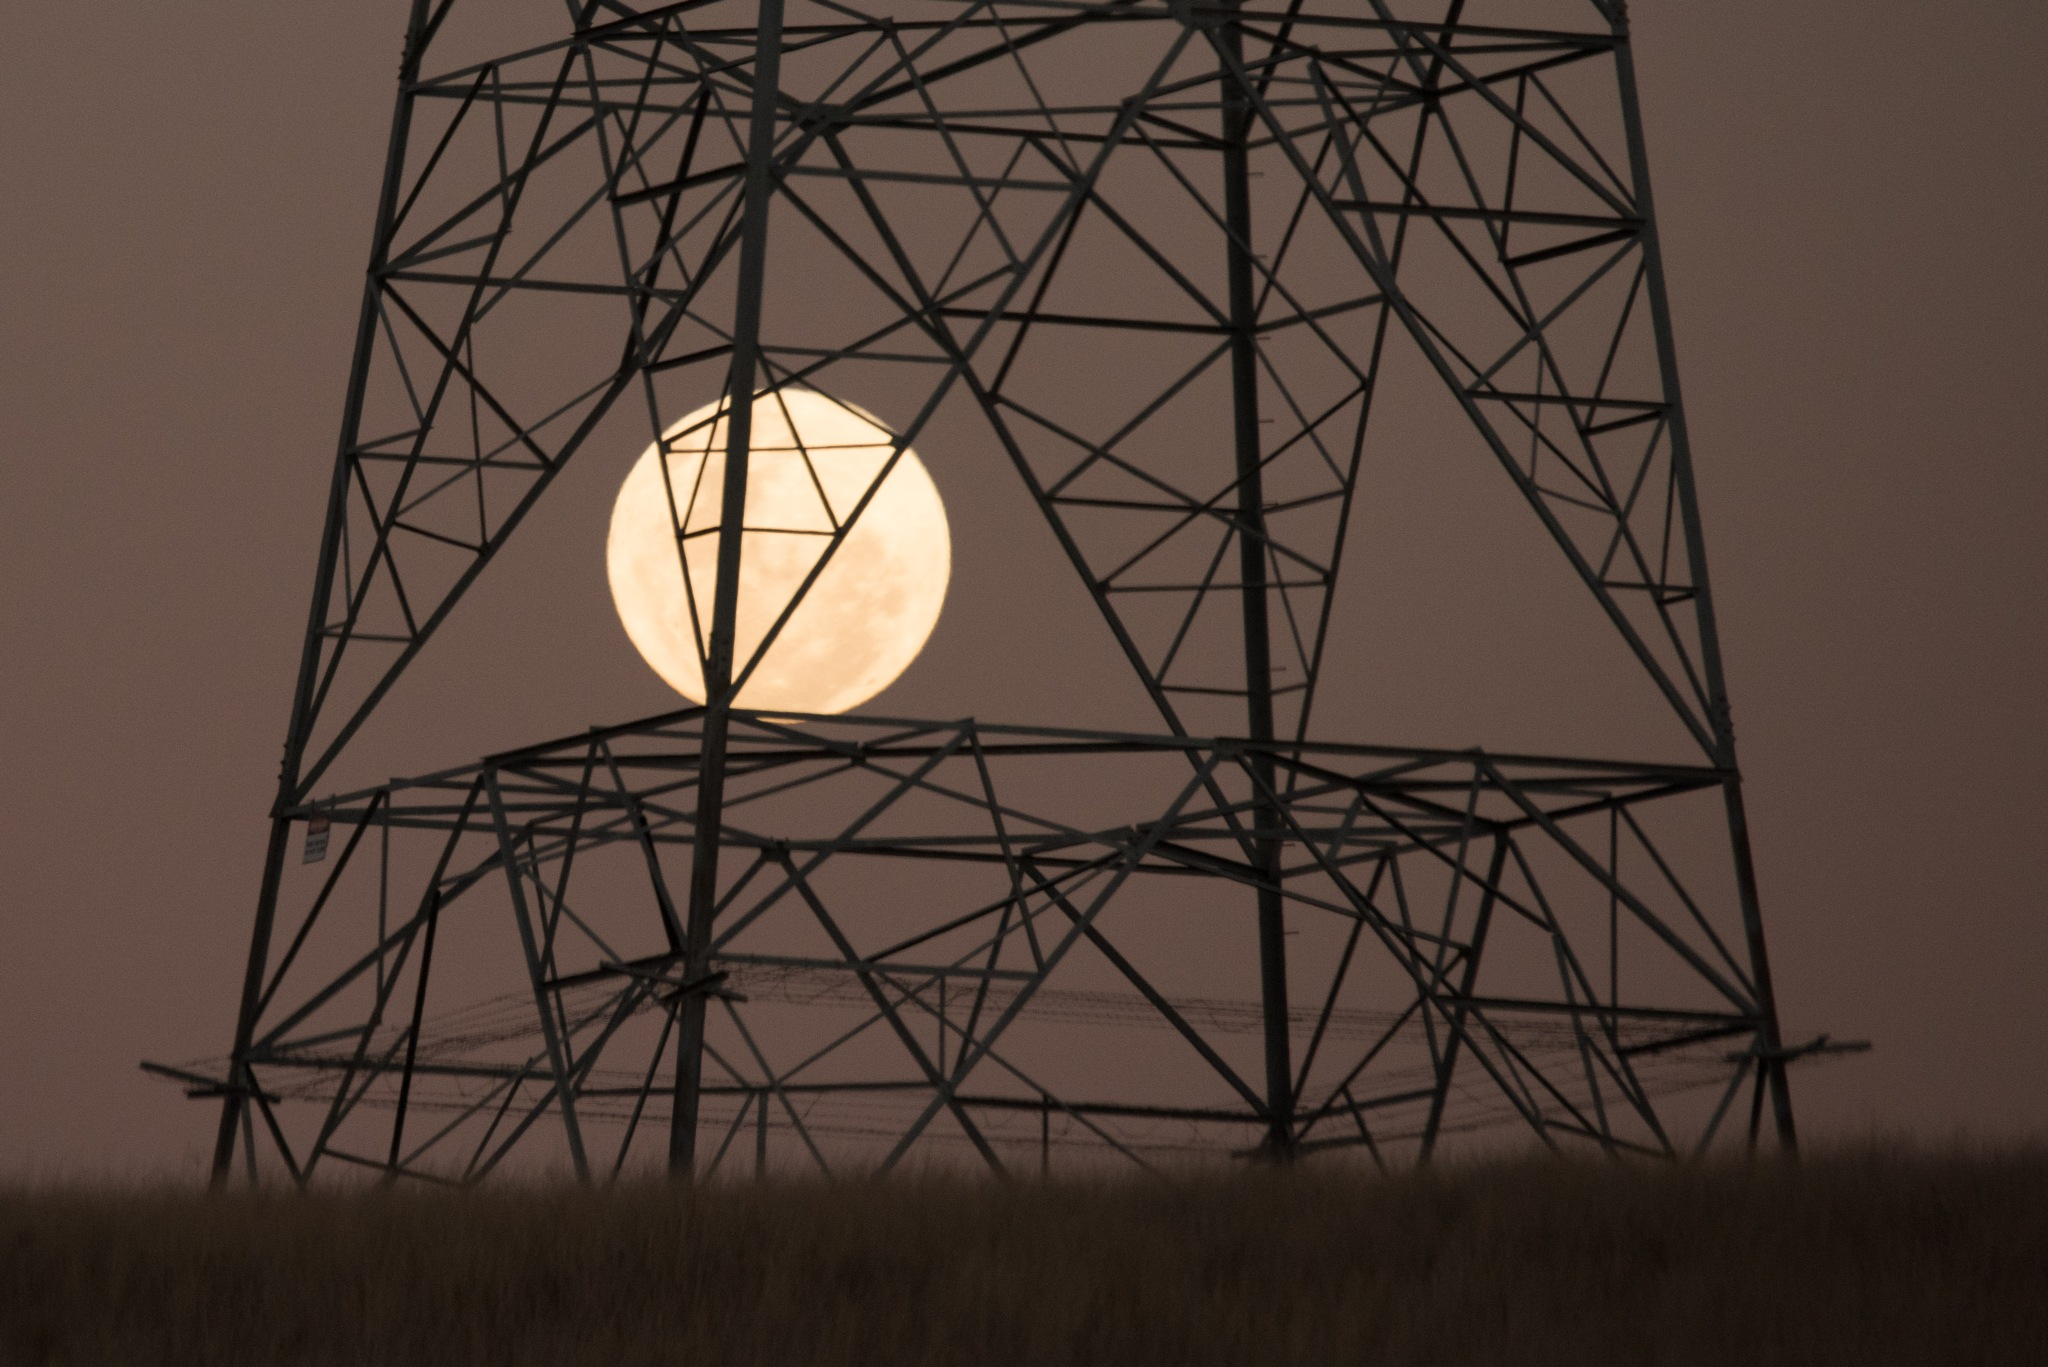 moon thru the pylon  by Karl Neuman